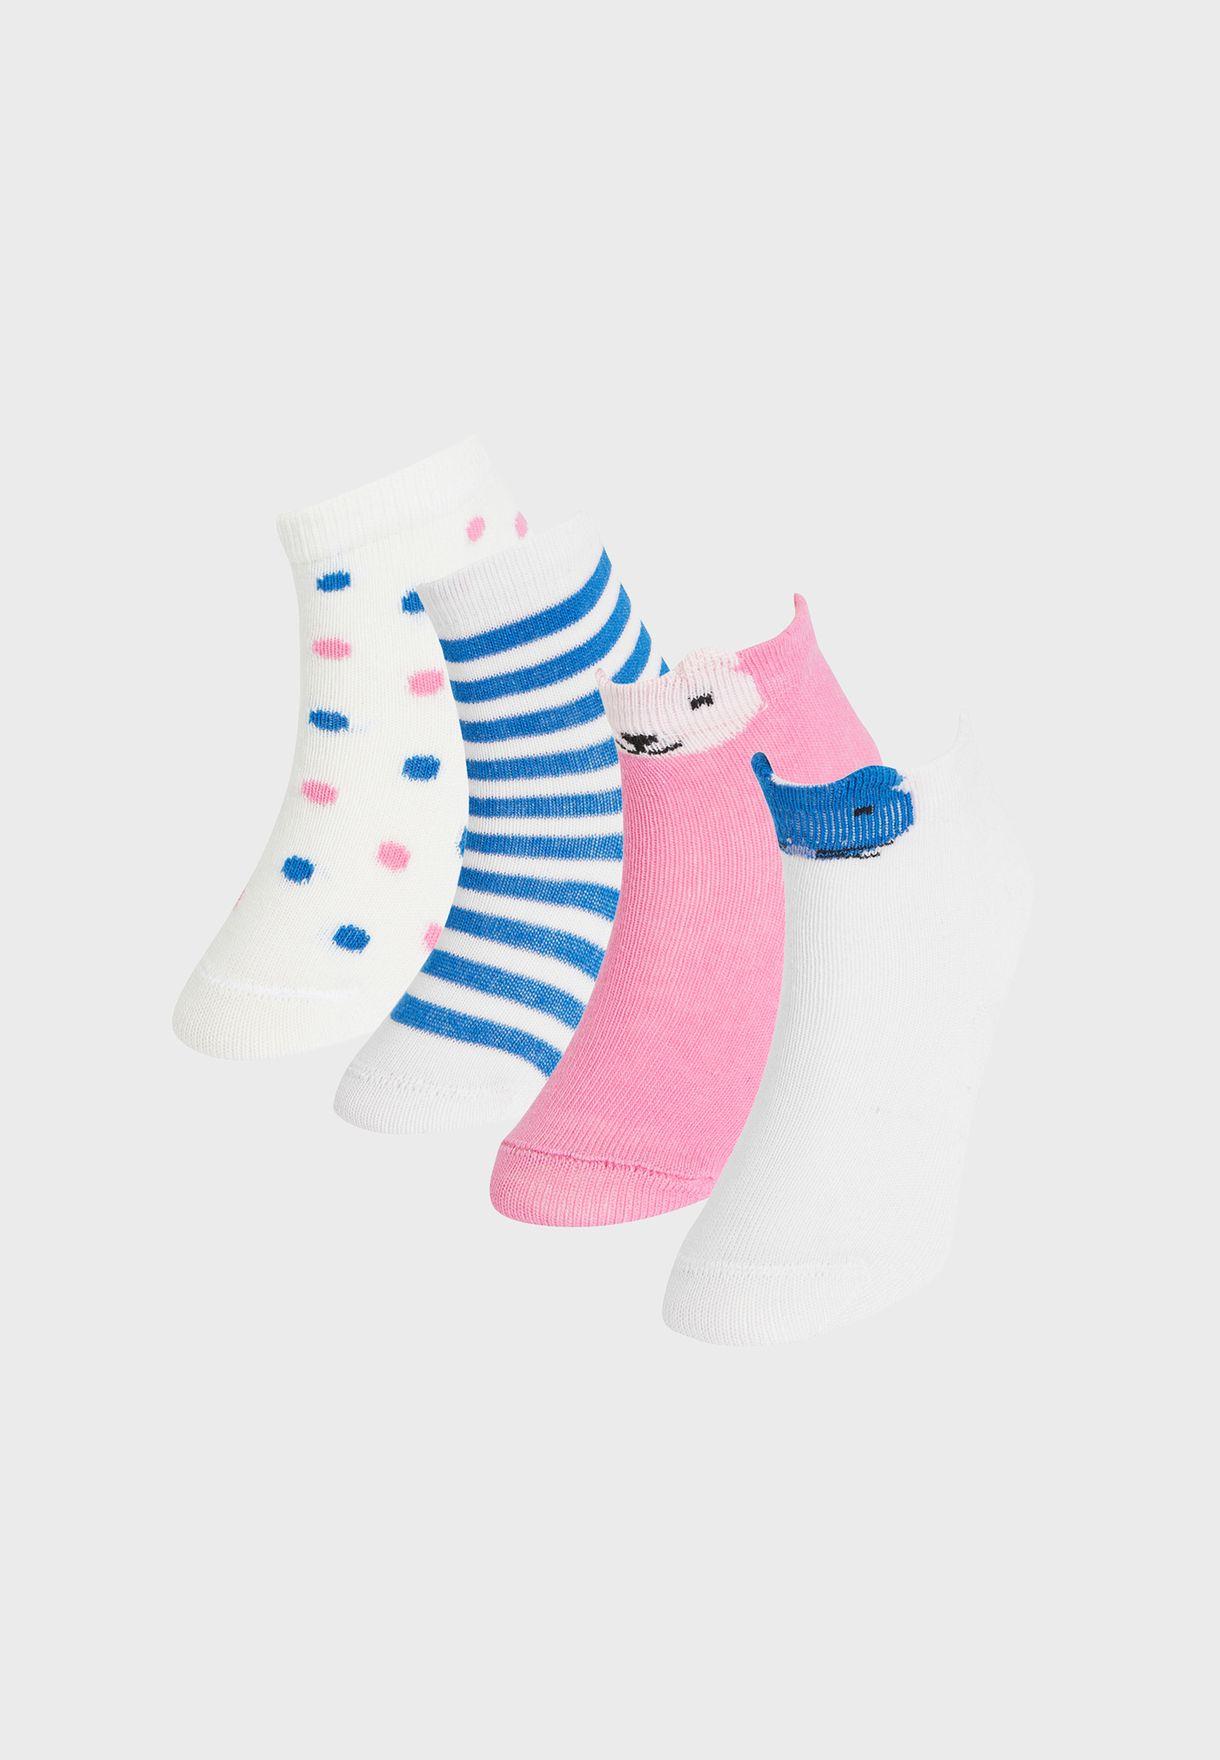 Infant 4 Pack Assorted Socks